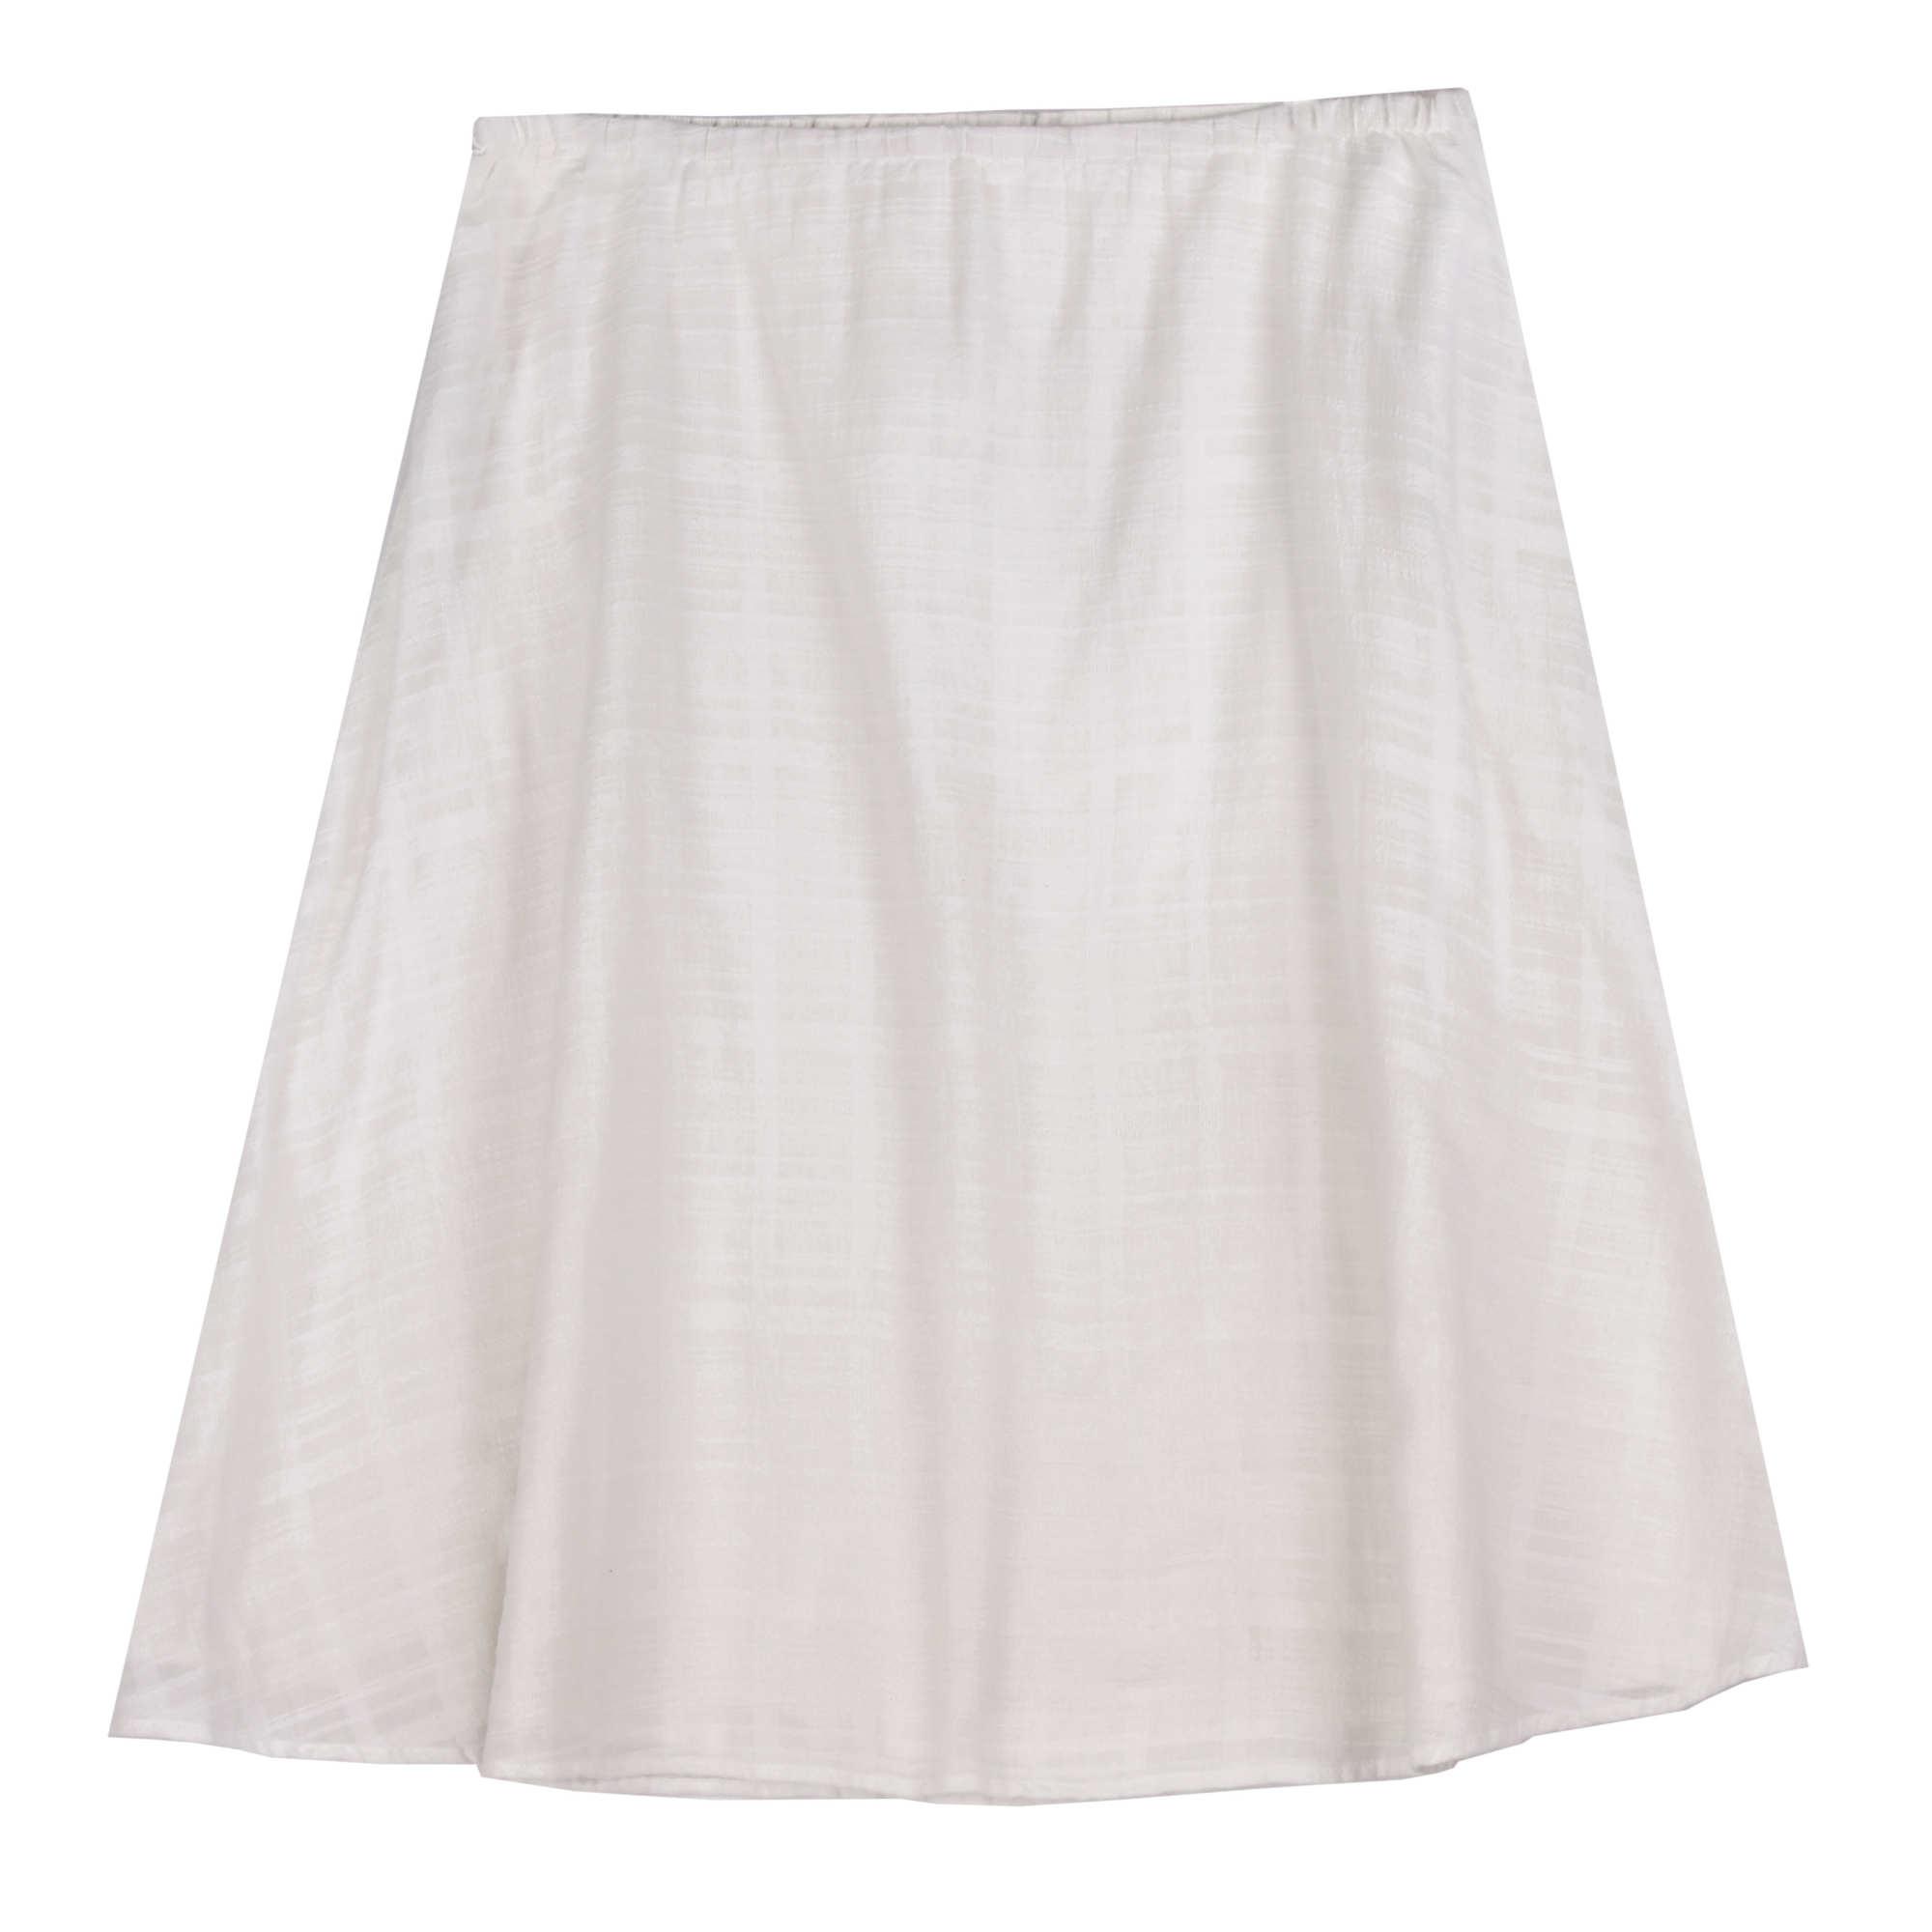 Plush Corduroy Skirt